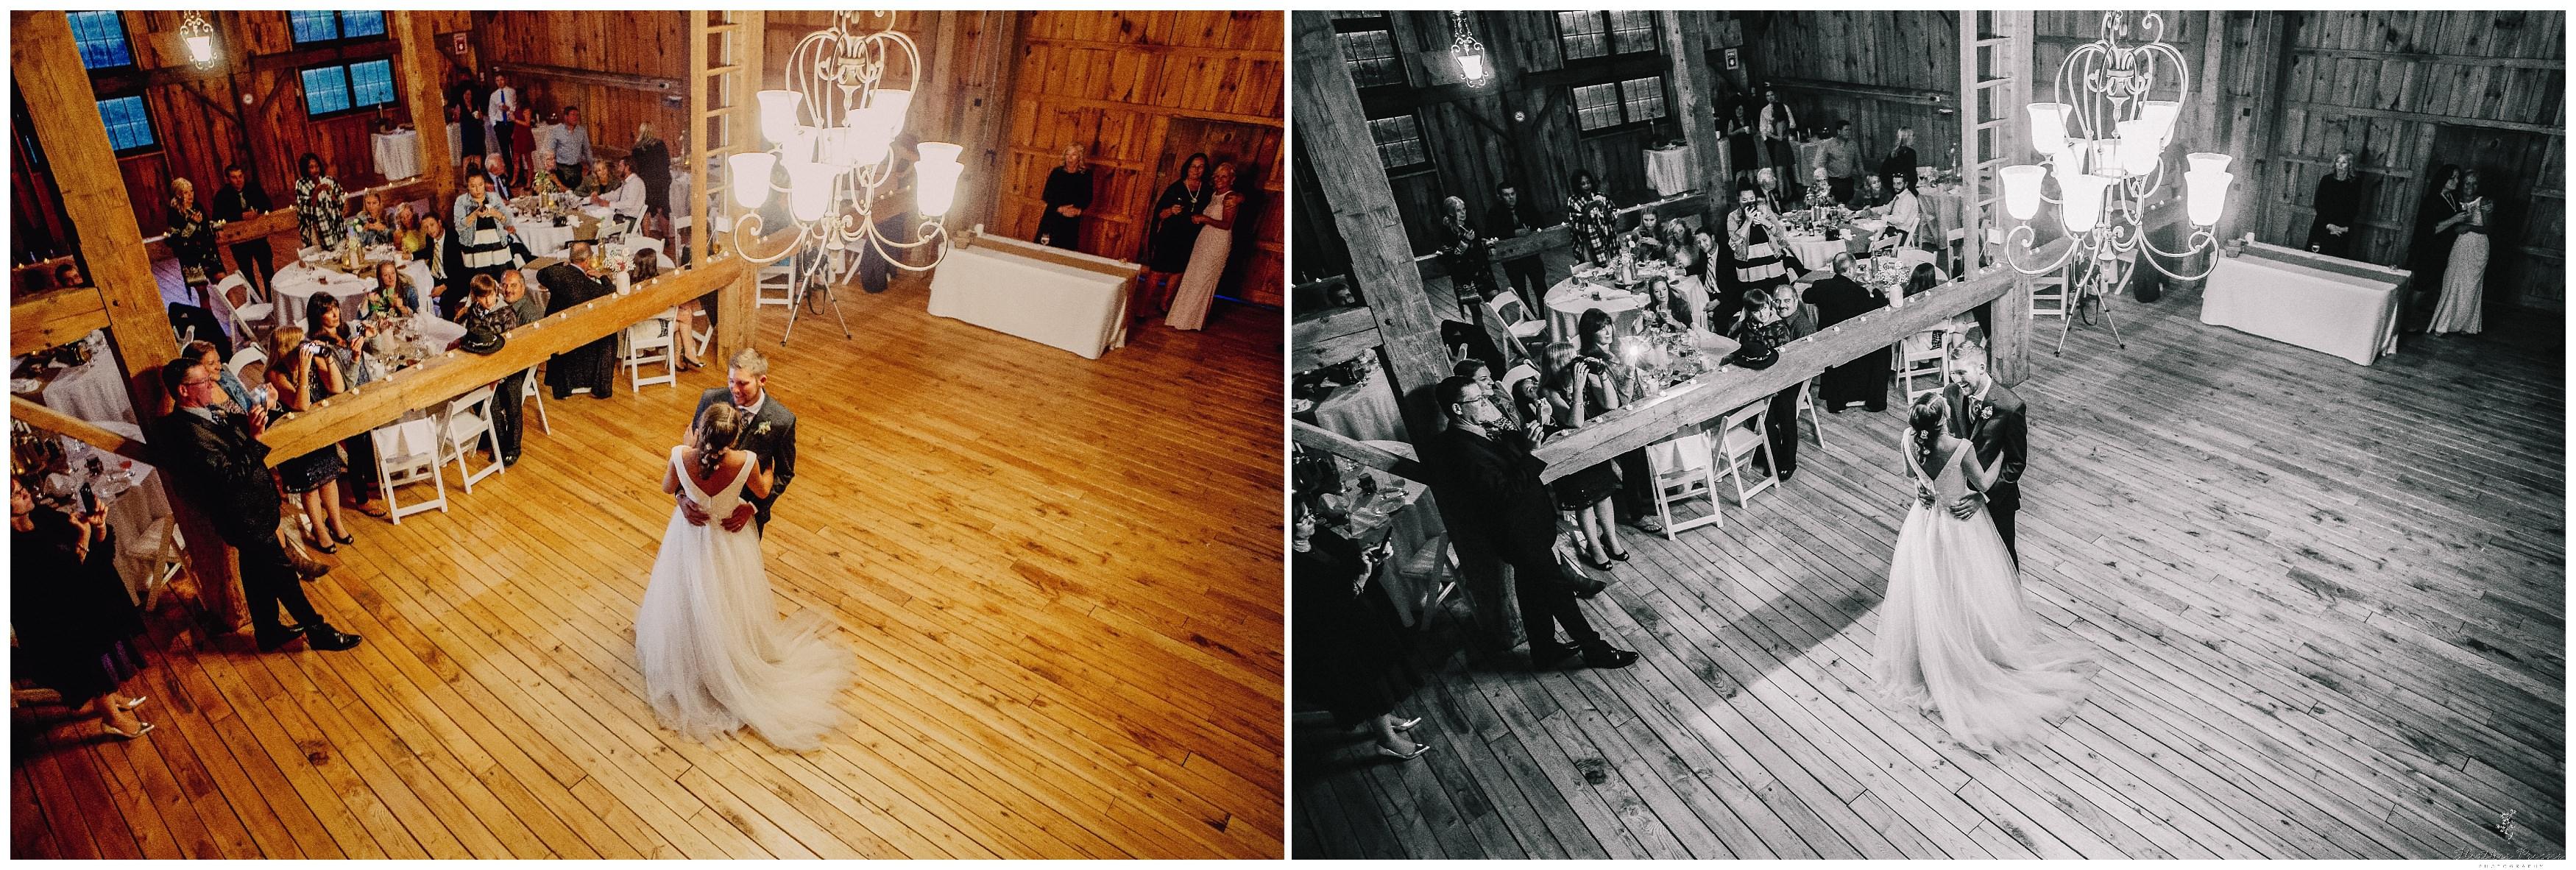 Ontario Barn Wedding_2276.jpg